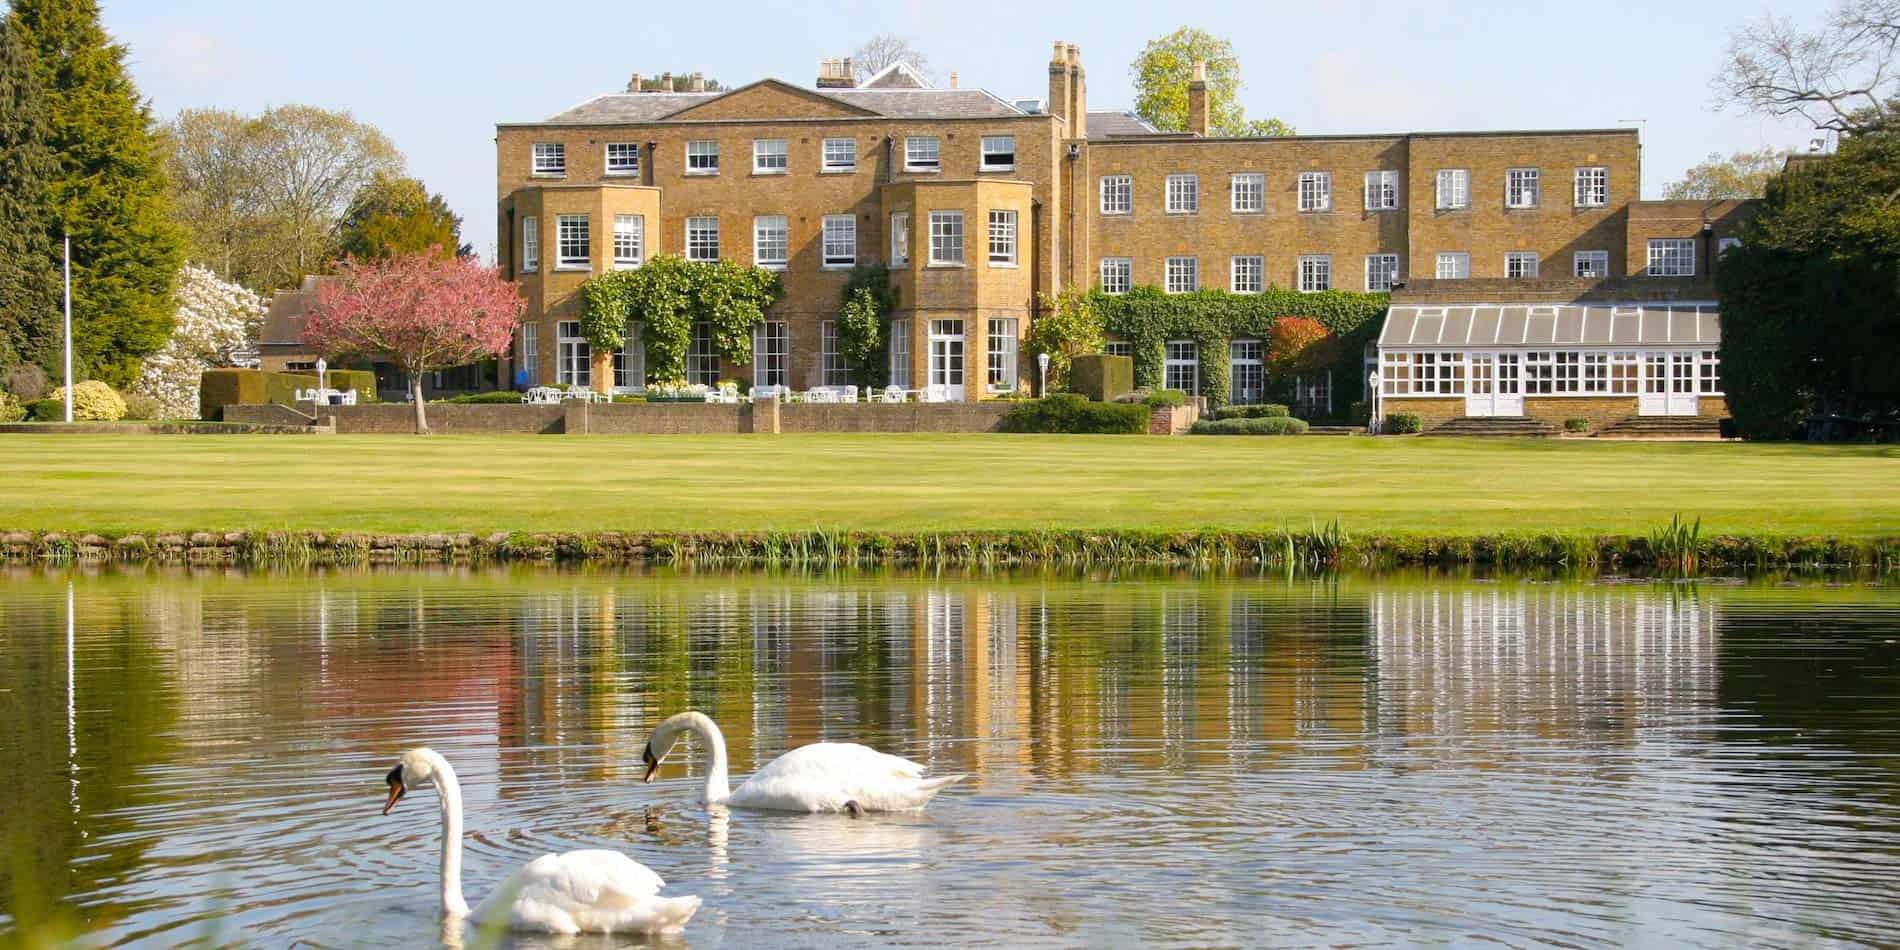 TASIS The American School in England